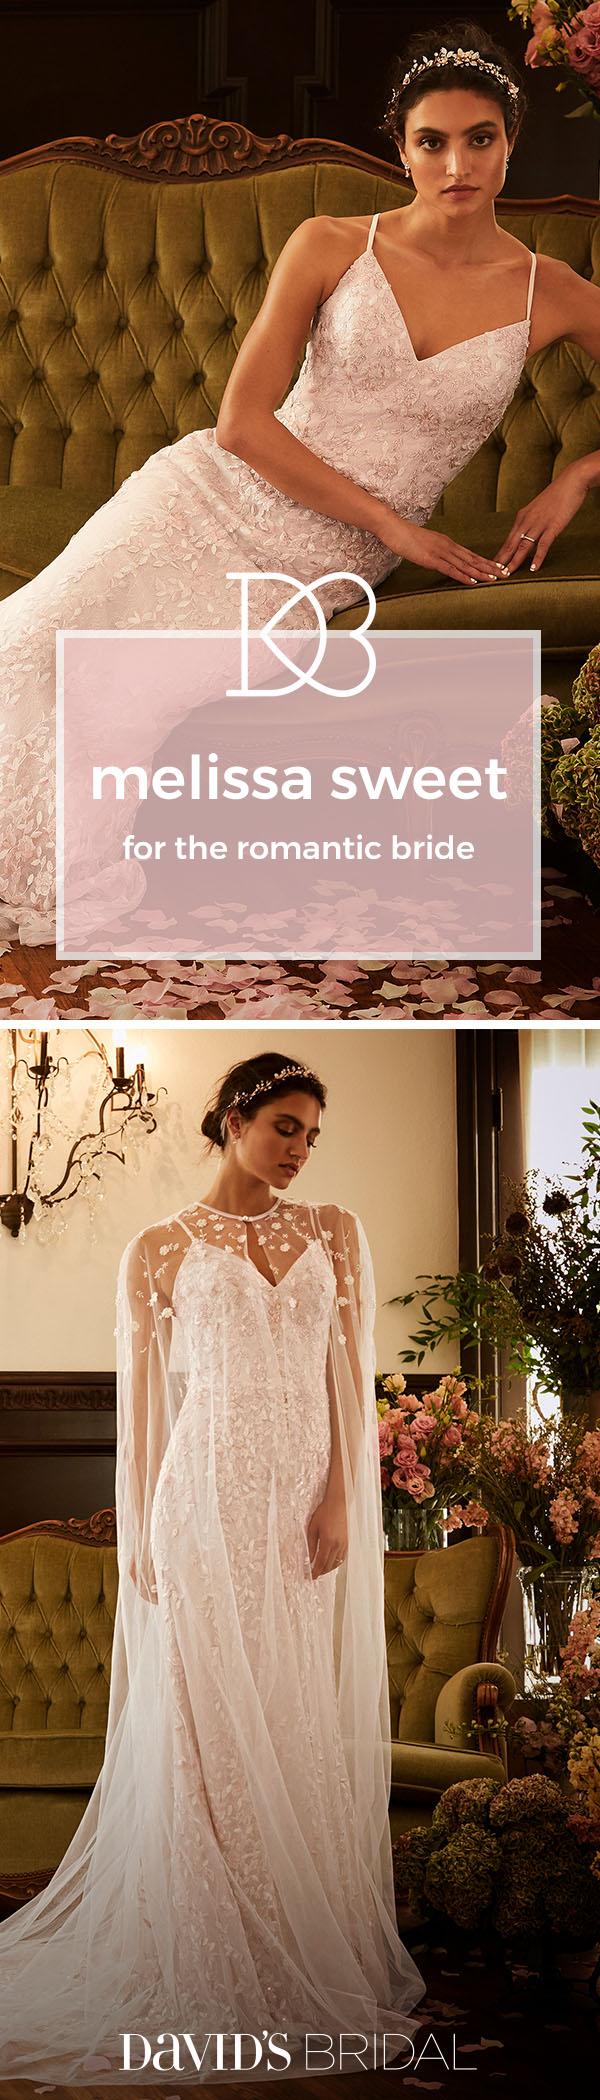 Melissa sweet wedding dresses are vintageinspired poetic and full